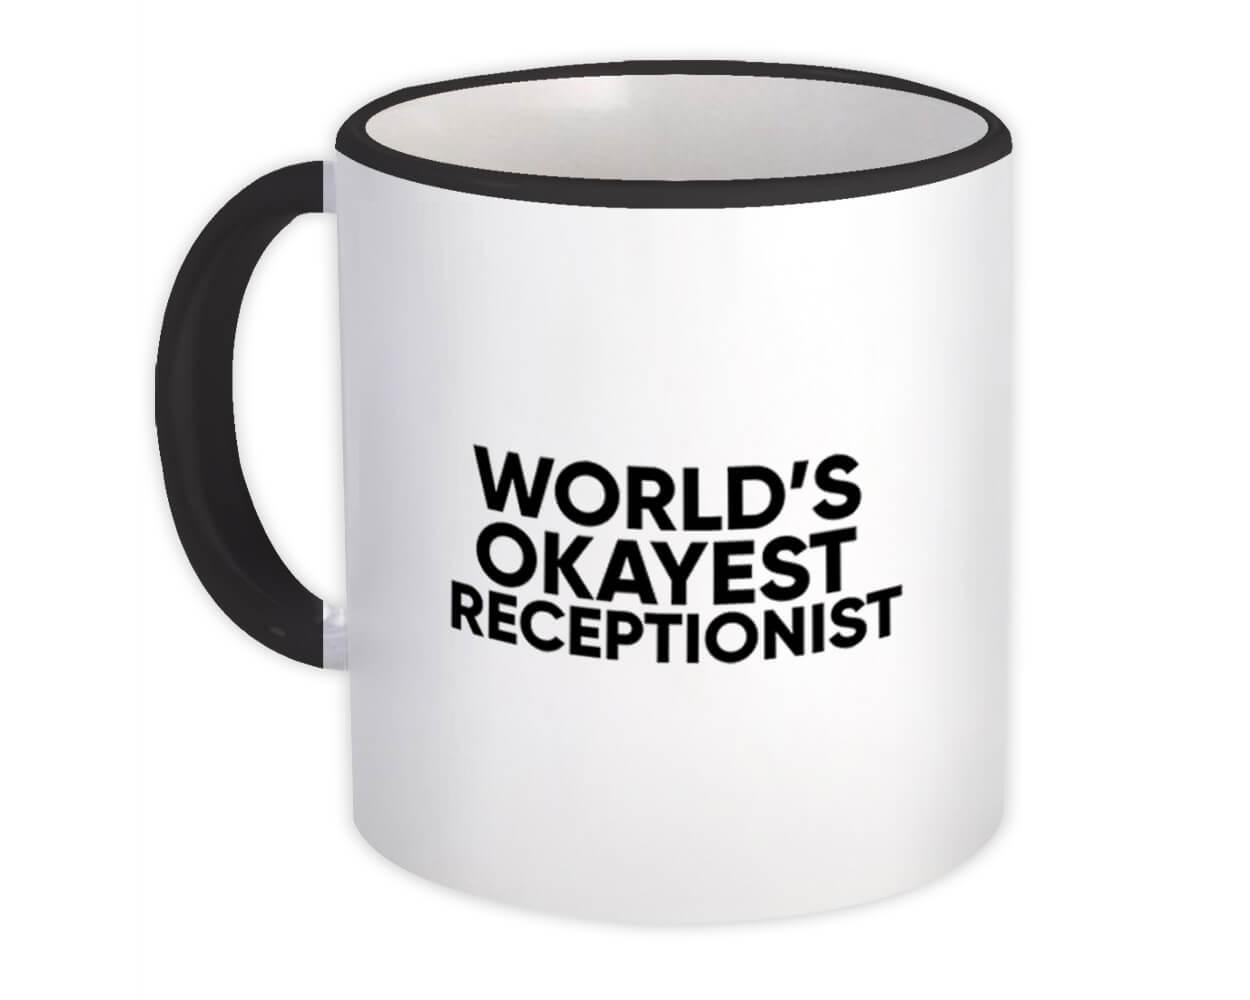 Worlds Okayest RECEPTIONIST : Gift Mug Text Family Work Christmas Birthday